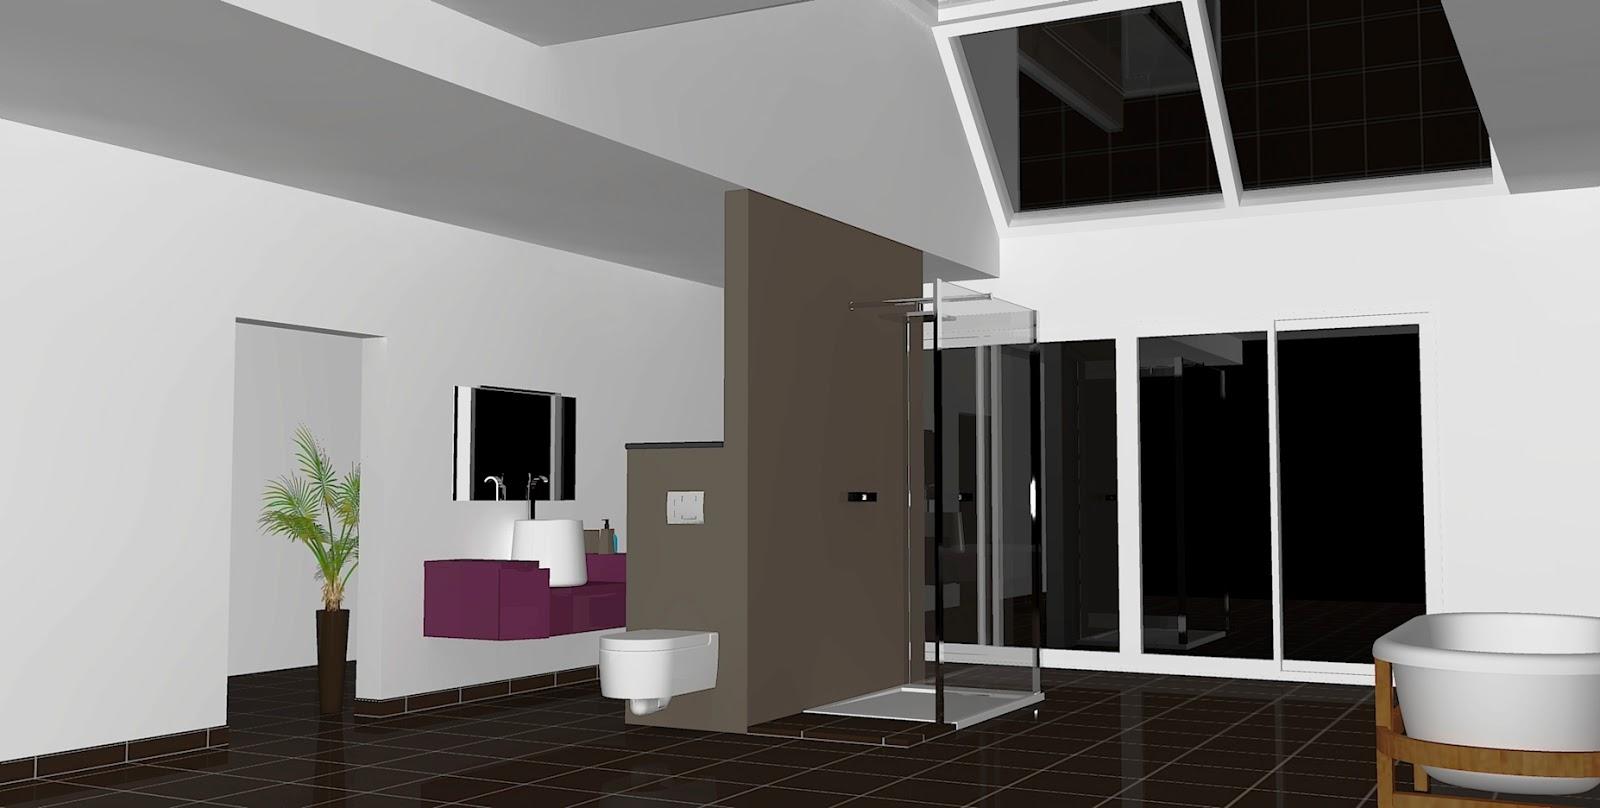 cuisines et bain kitchens and bath cr ation salle de bain bathroom designing. Black Bedroom Furniture Sets. Home Design Ideas